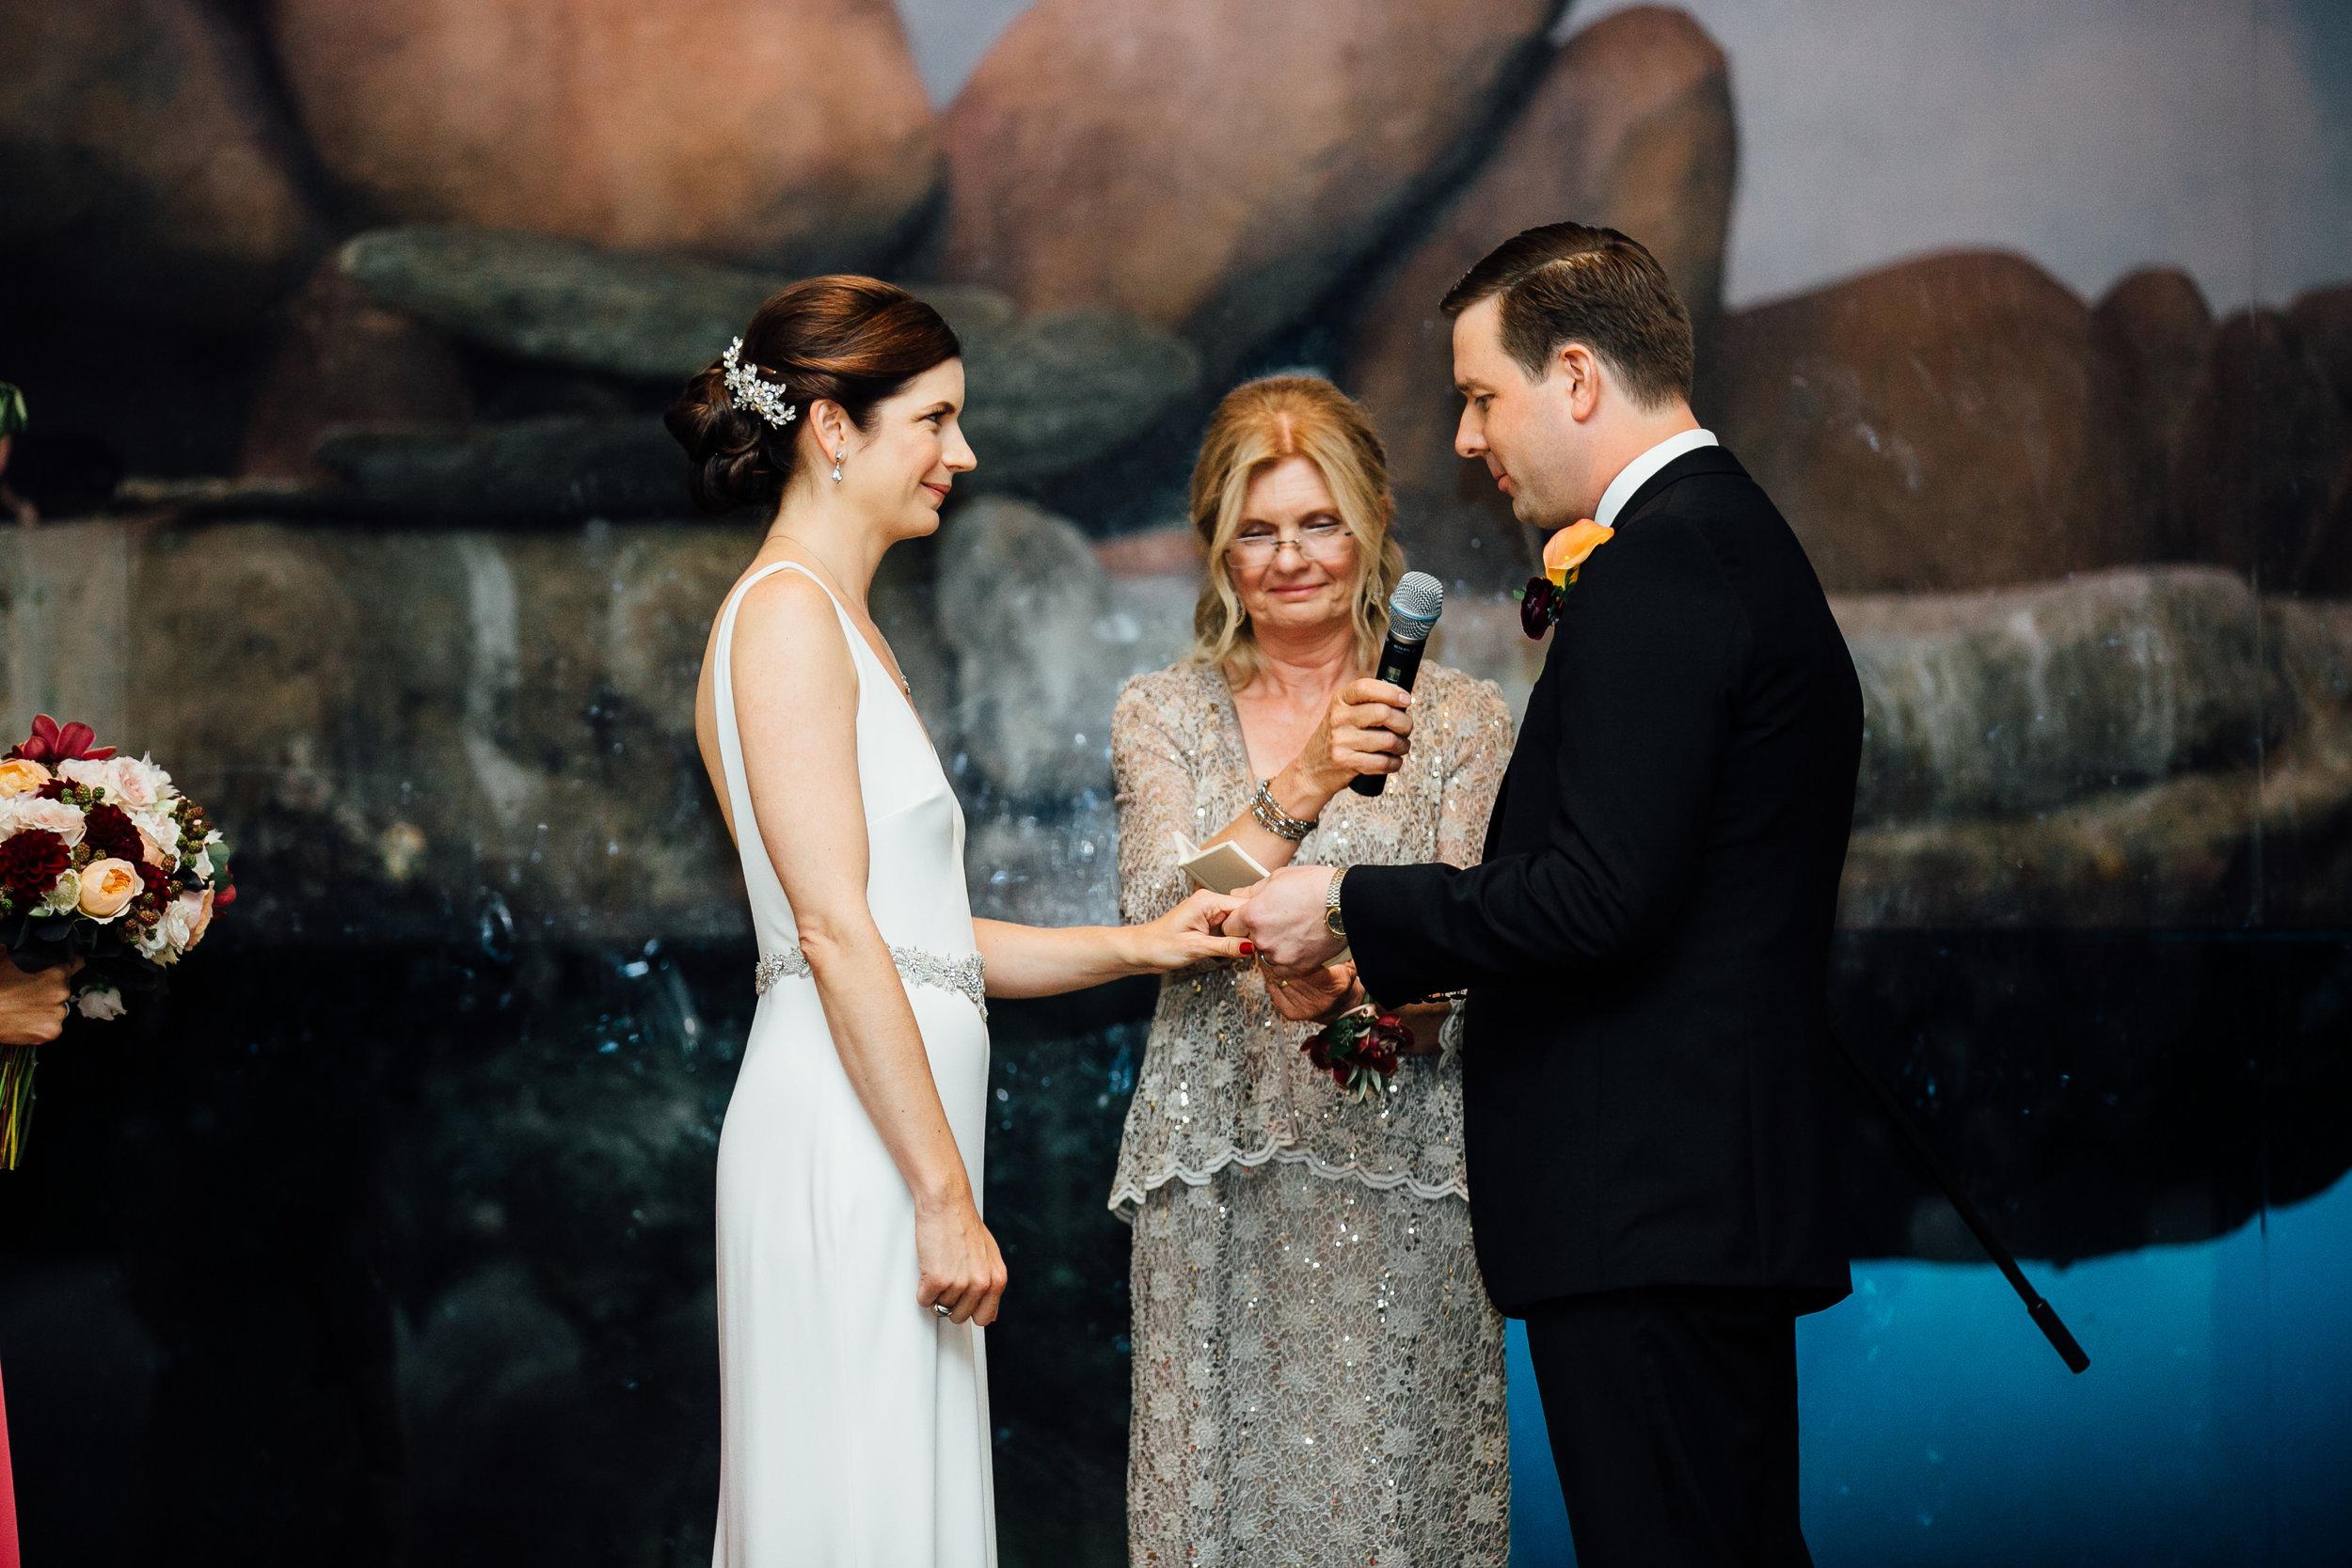 Wedding_KathleenMichael_Ceremony-202.jpg